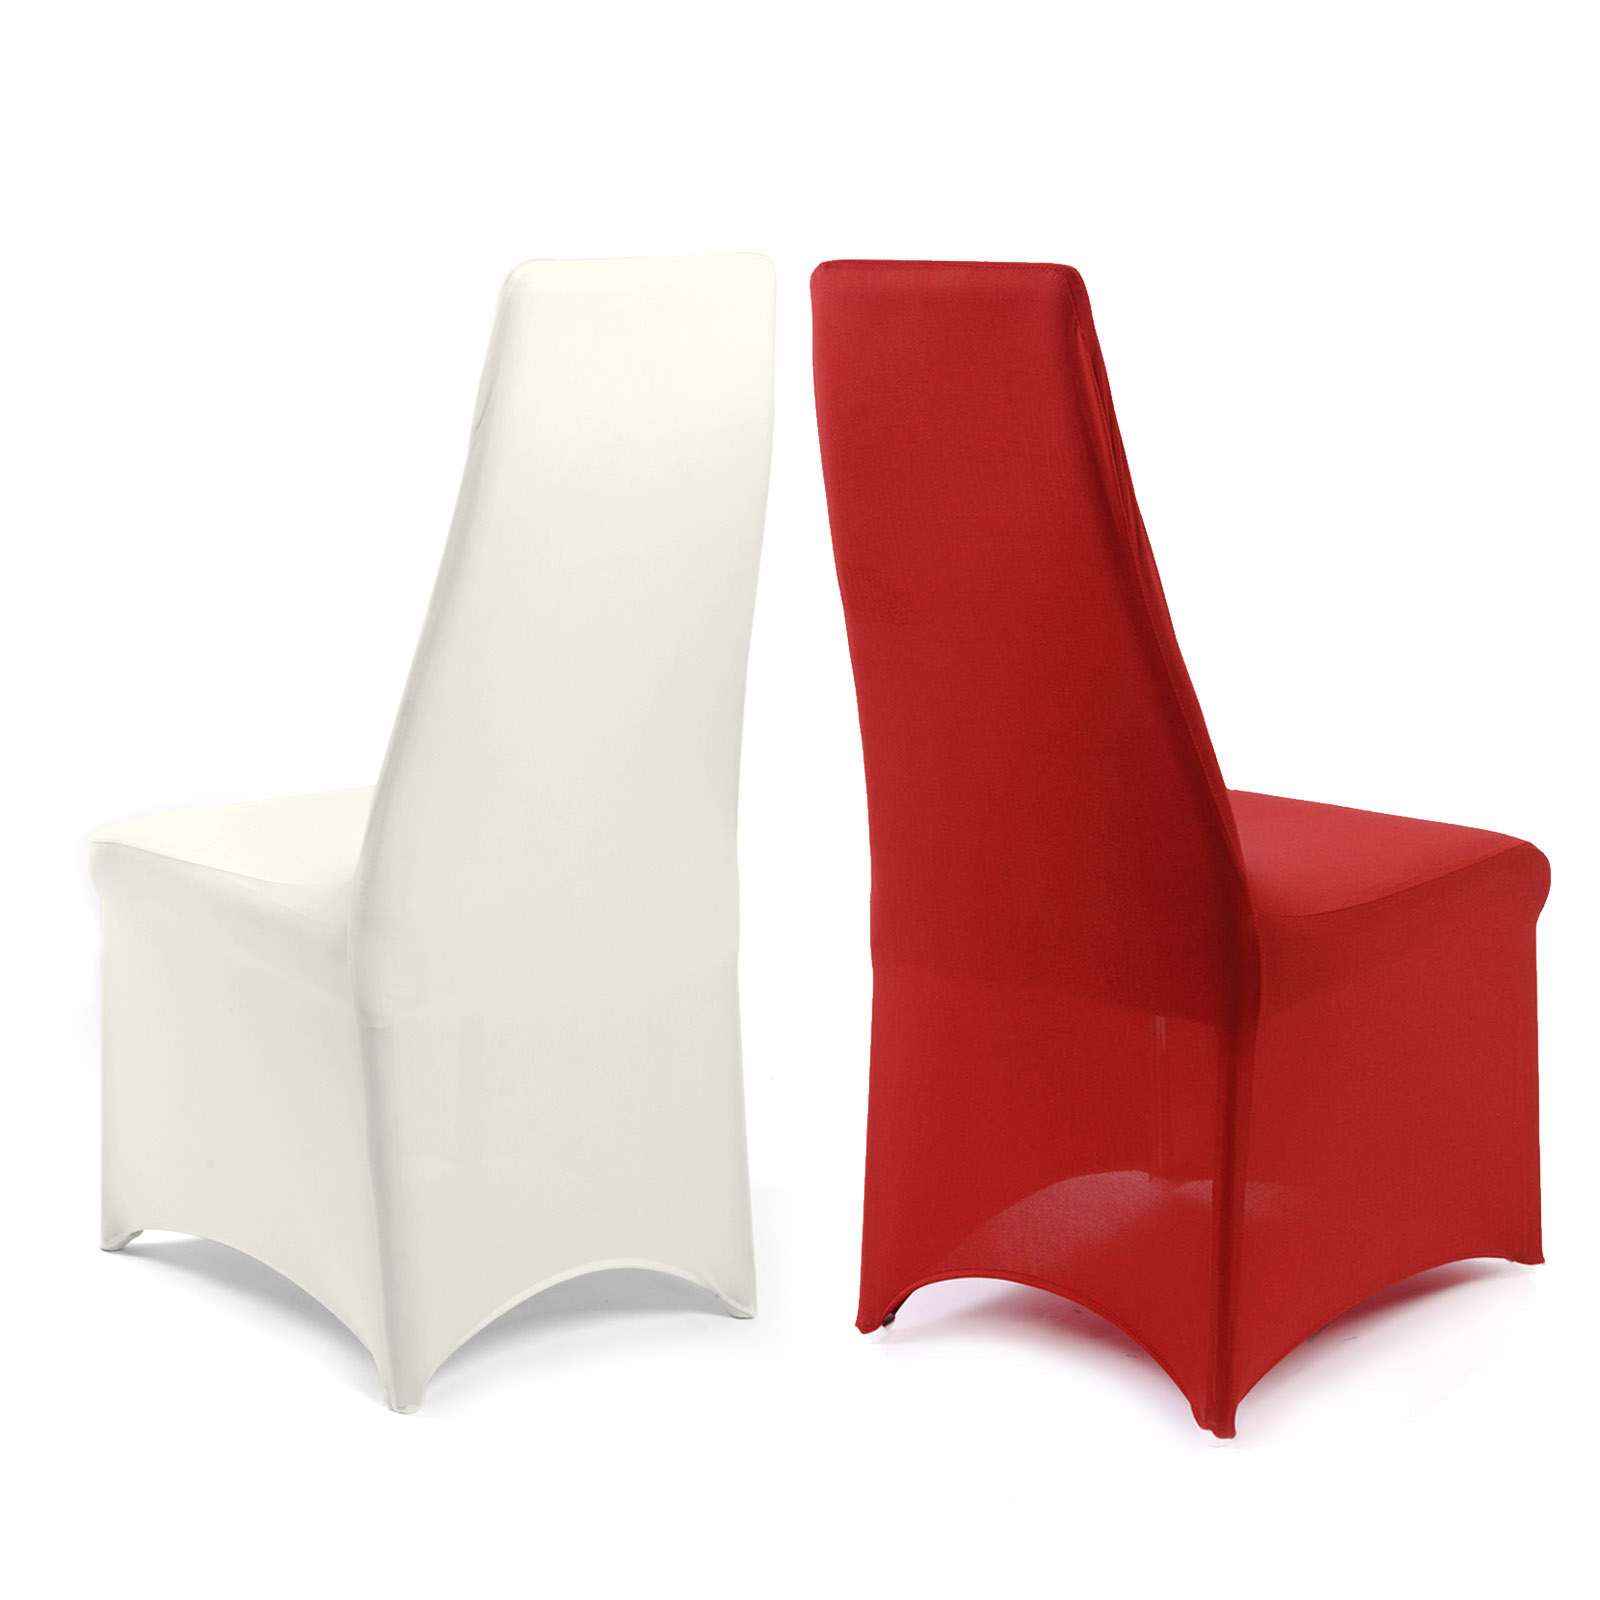 stuhlhussen stretch universell stuhl berzug stuhlbezug hussen hochzeit 1 100st ebay. Black Bedroom Furniture Sets. Home Design Ideas